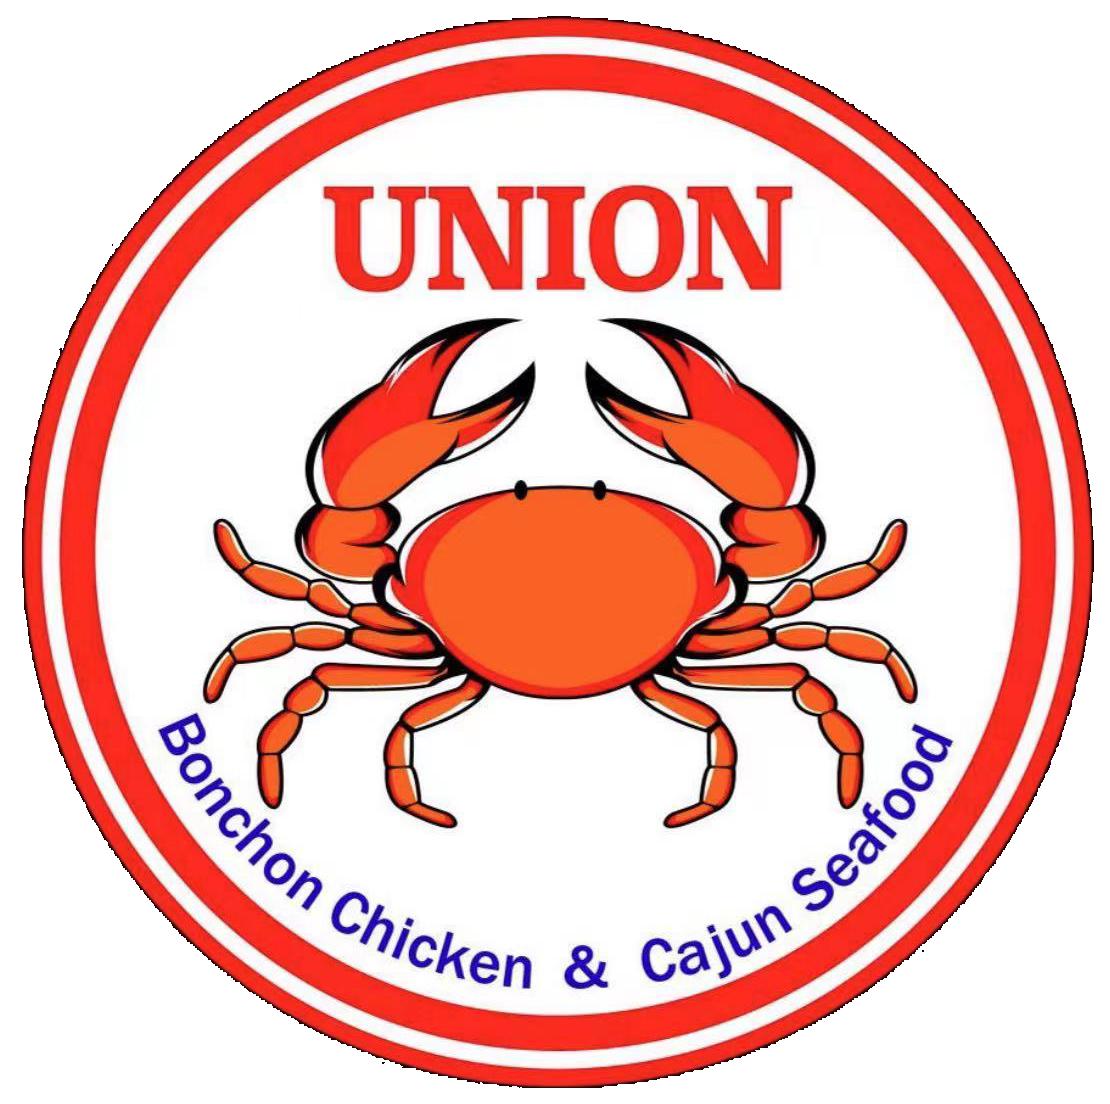 Union Bonchon Chicken & Cajun Seafood